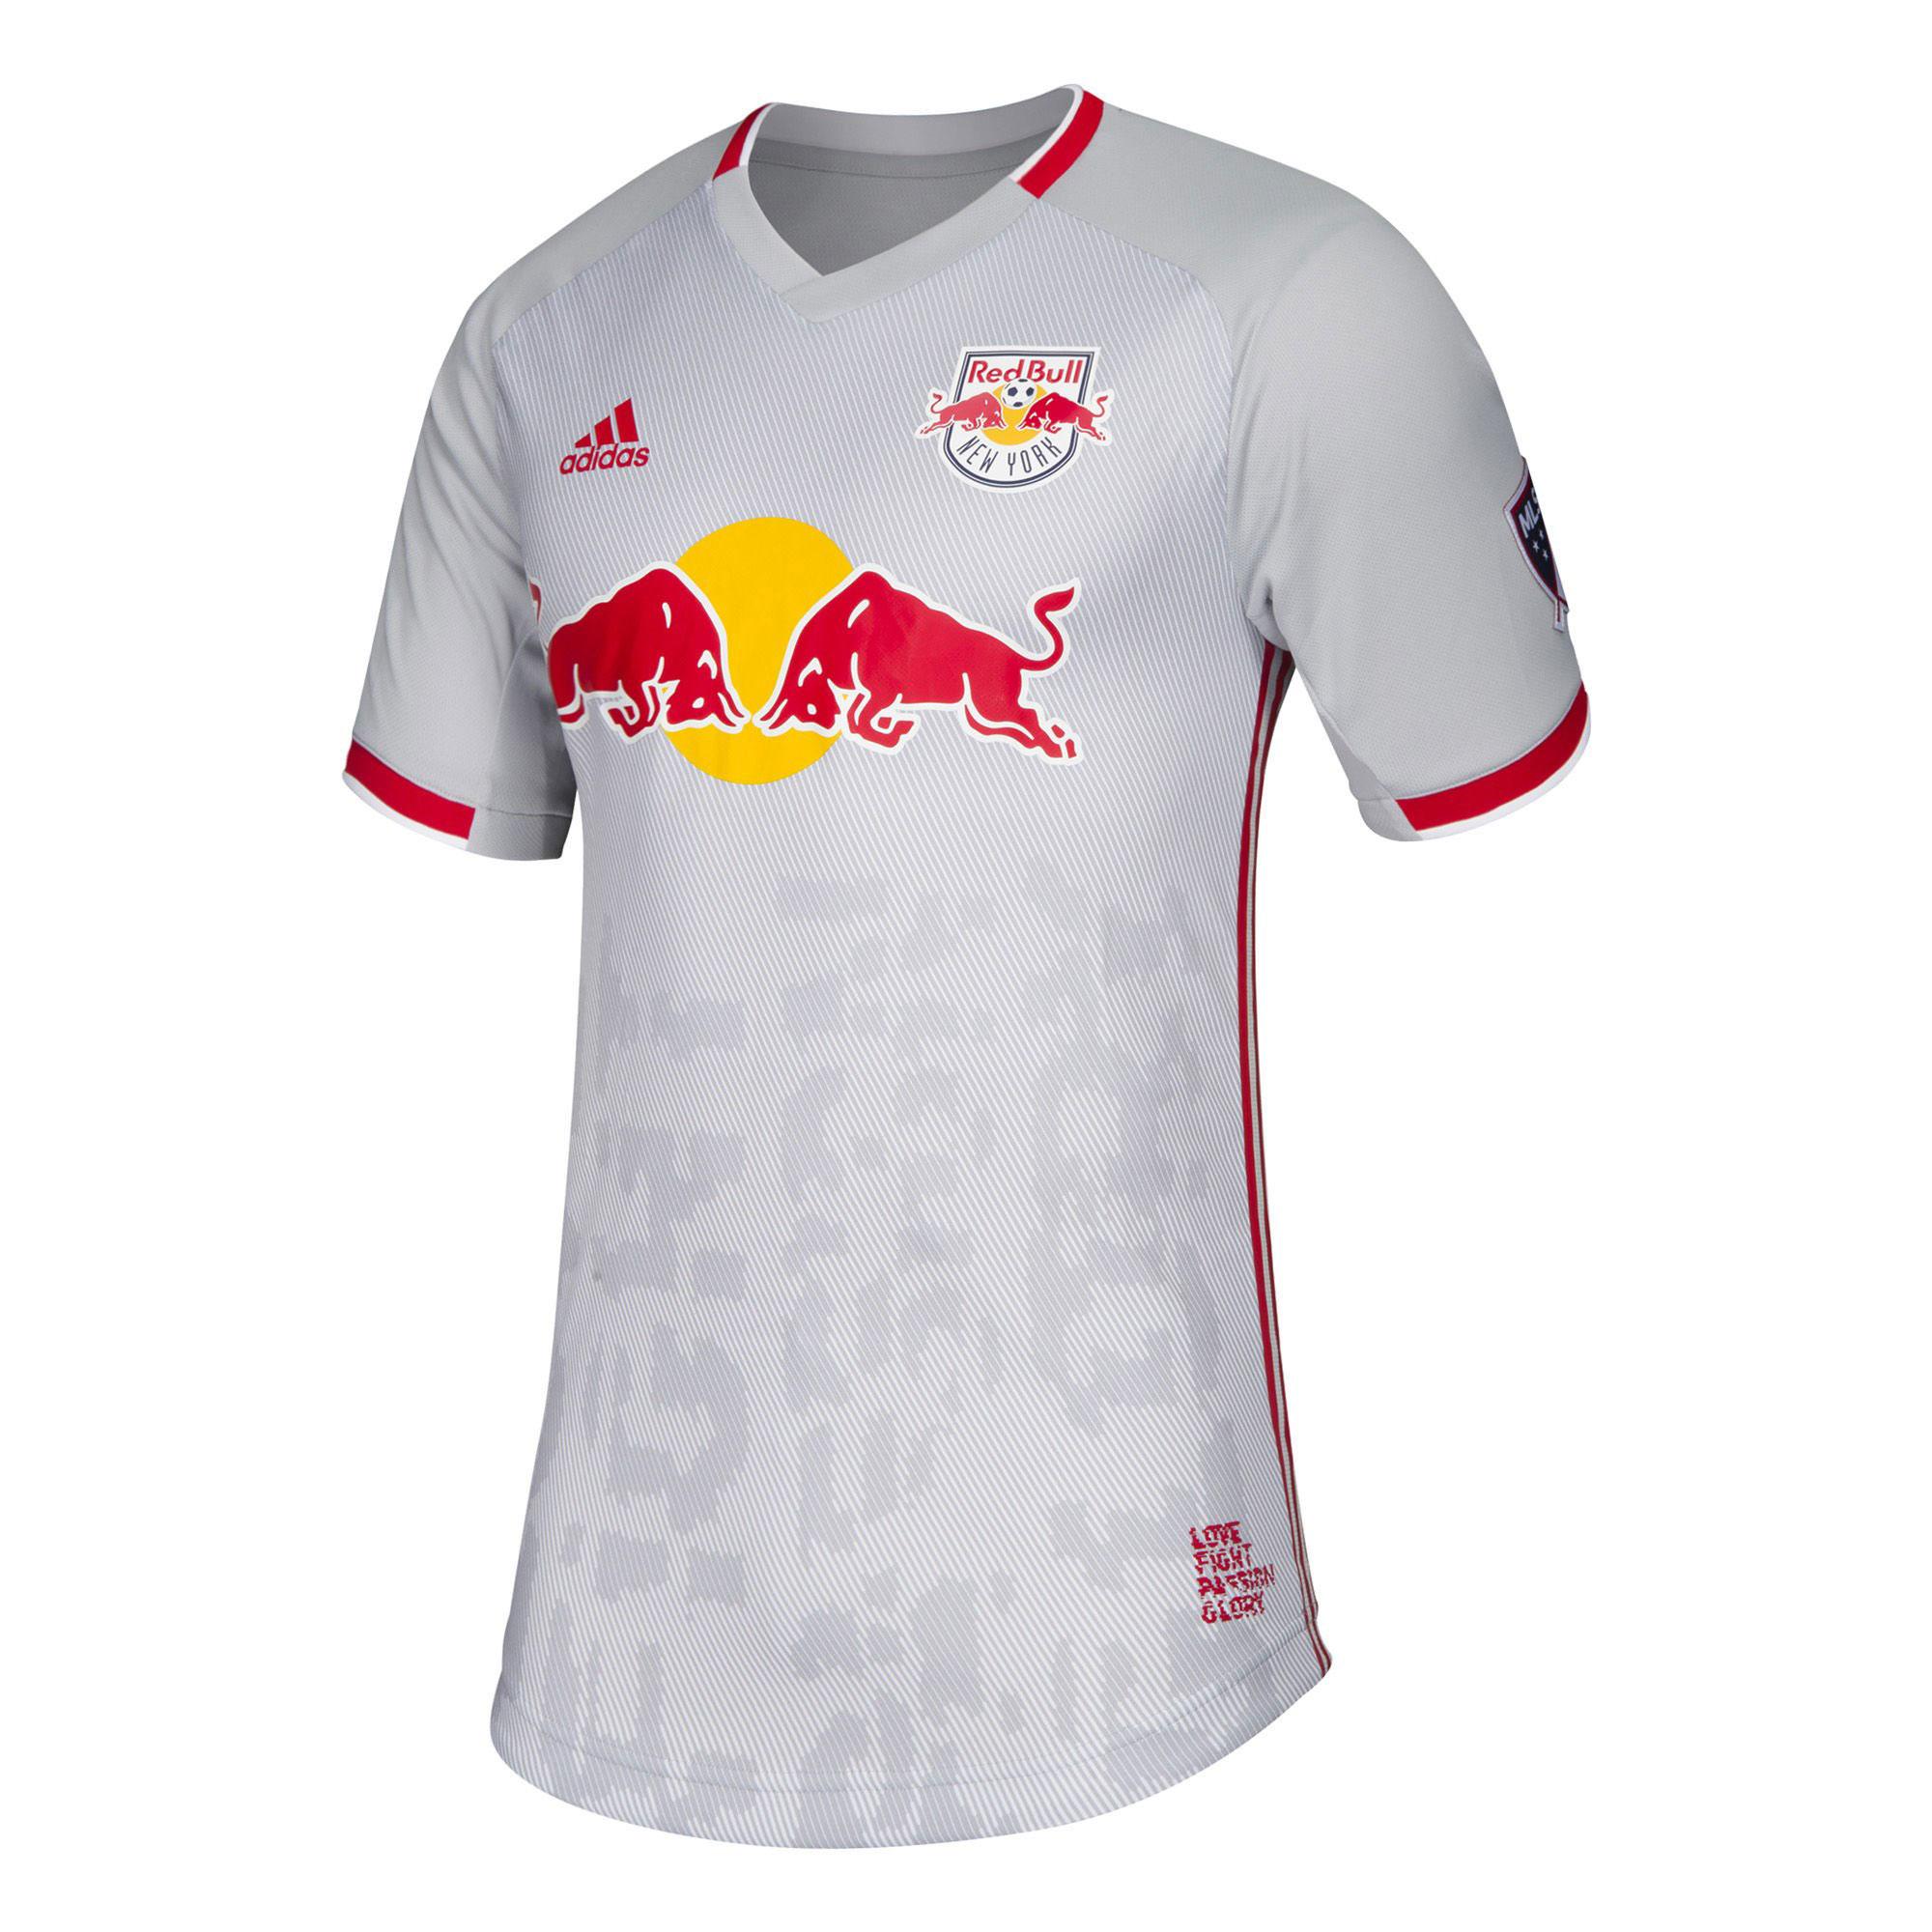 New York Red Bulls Primary Authentic Shirt 2019